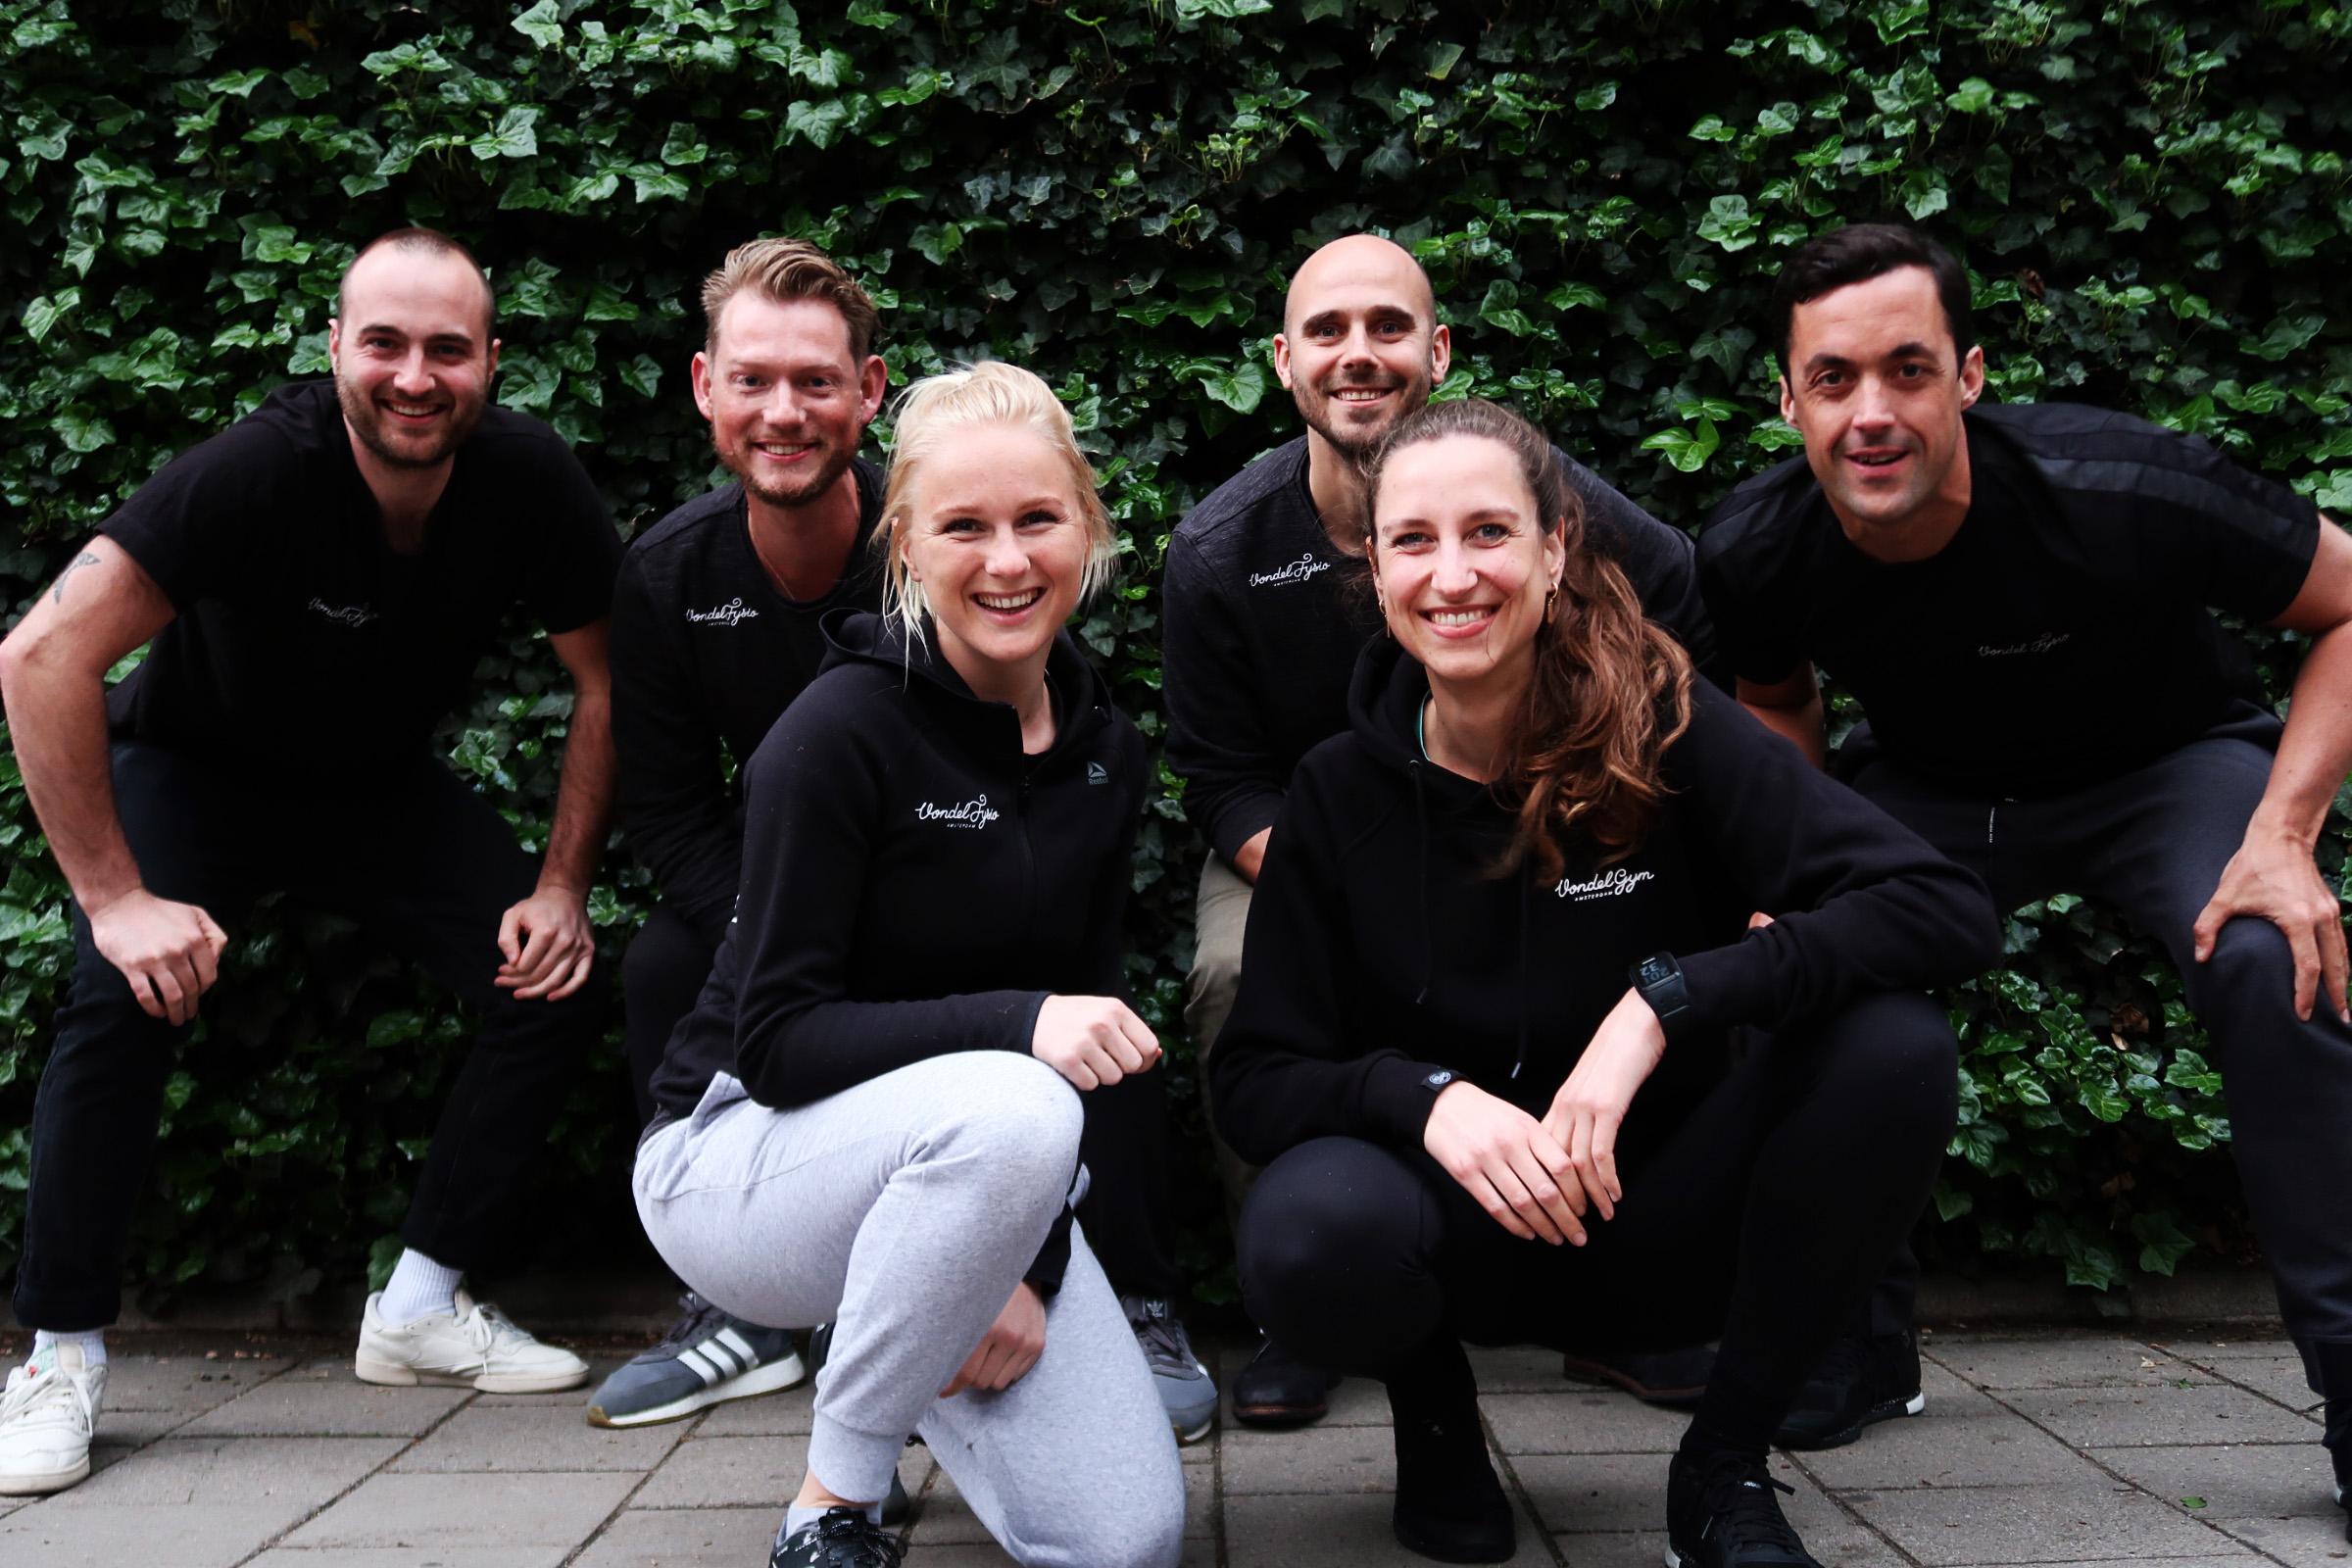 Pim fysiotherapeut en Manueel therapeut Amsterdam Oost